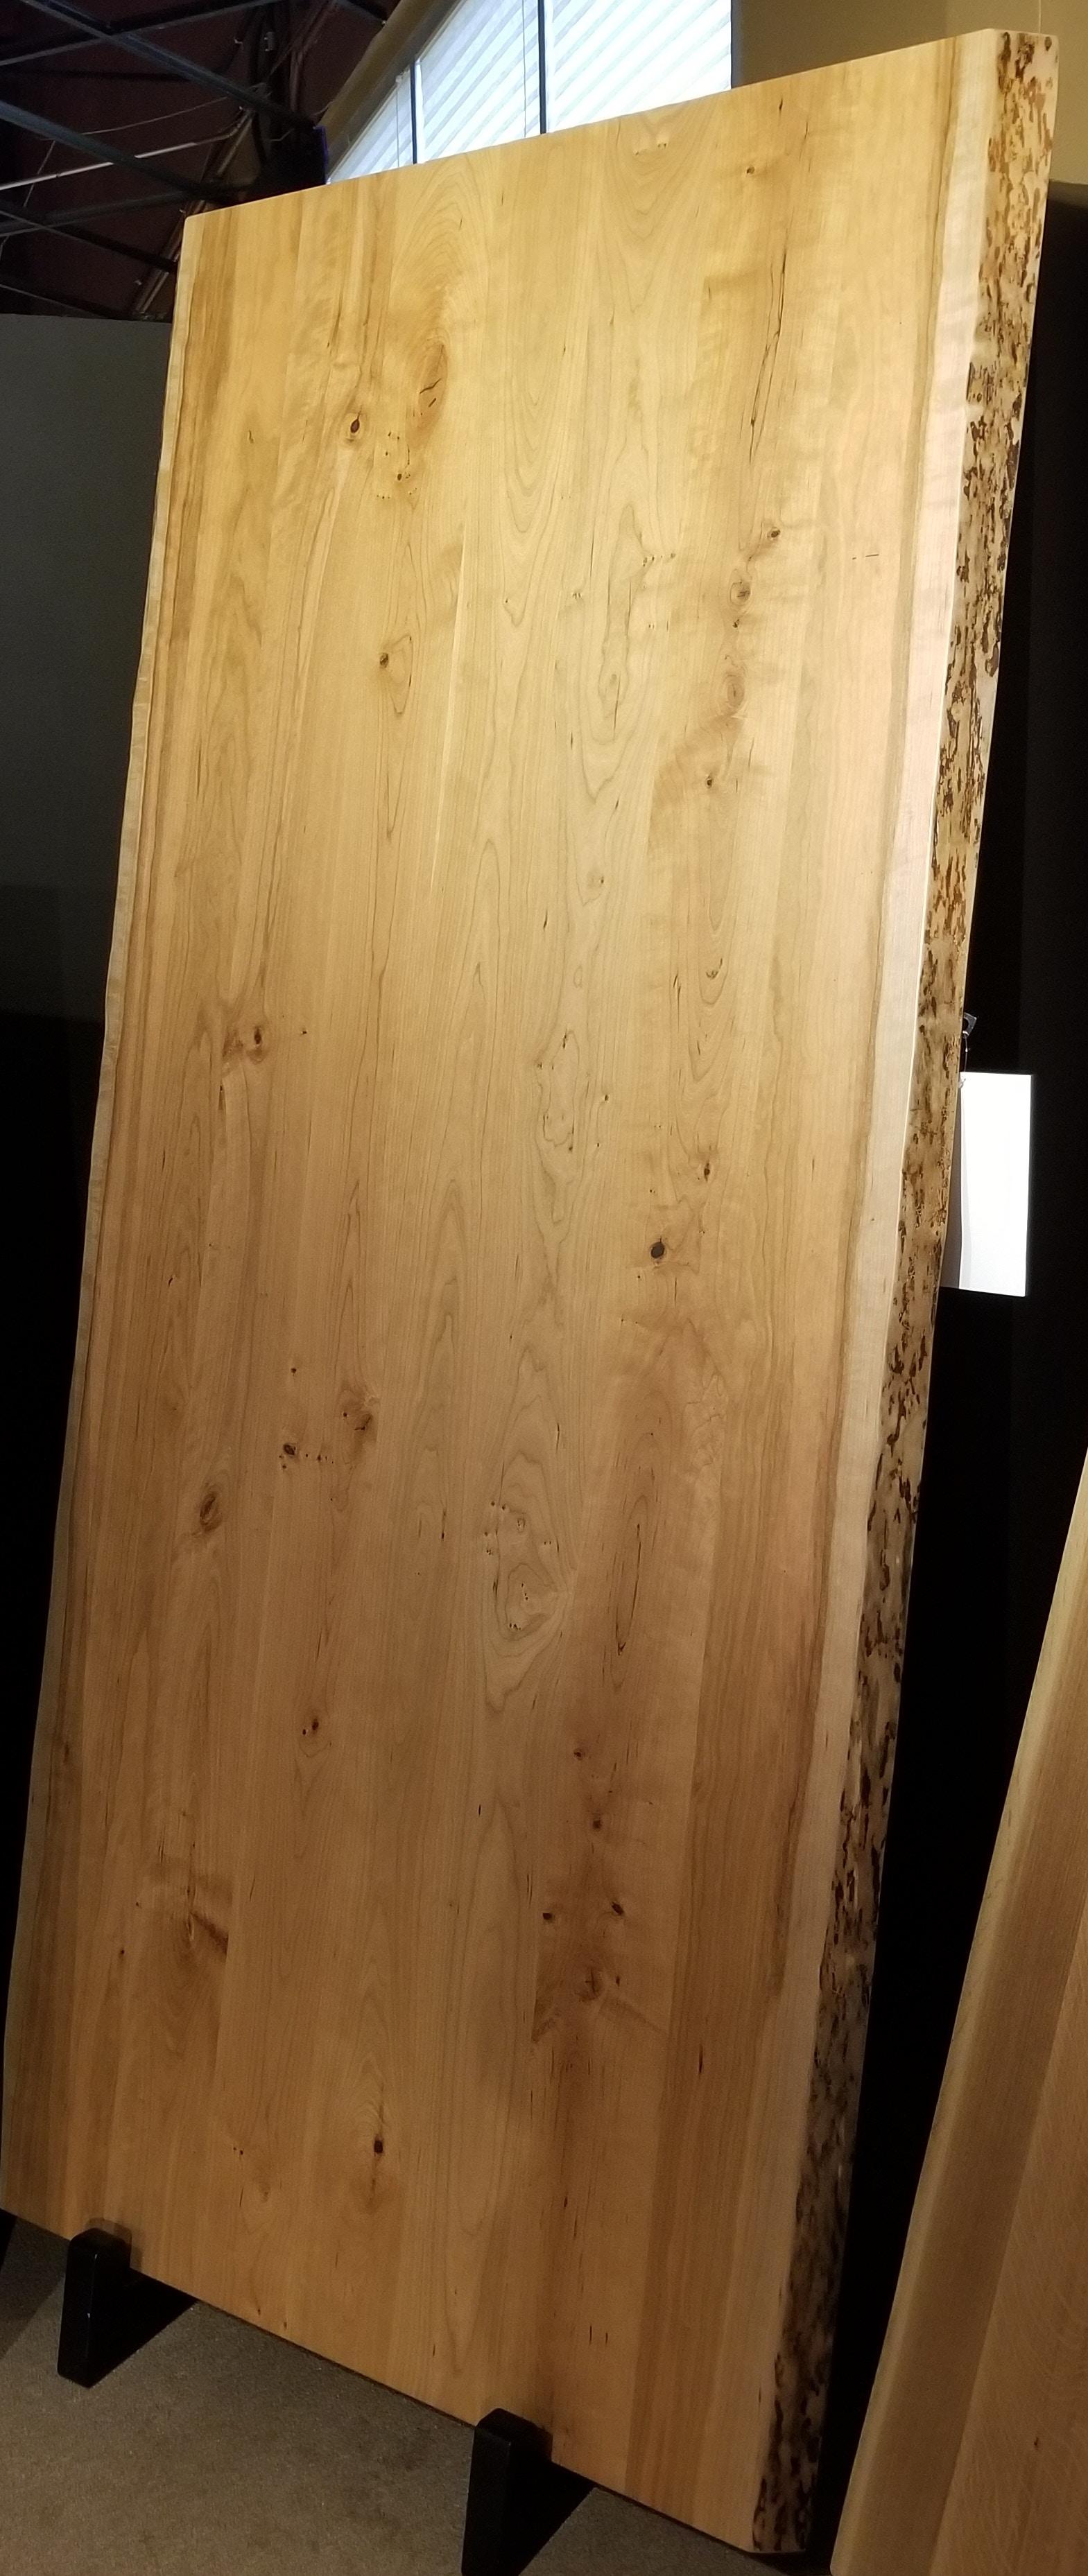 Treeforms Furniture Gallery